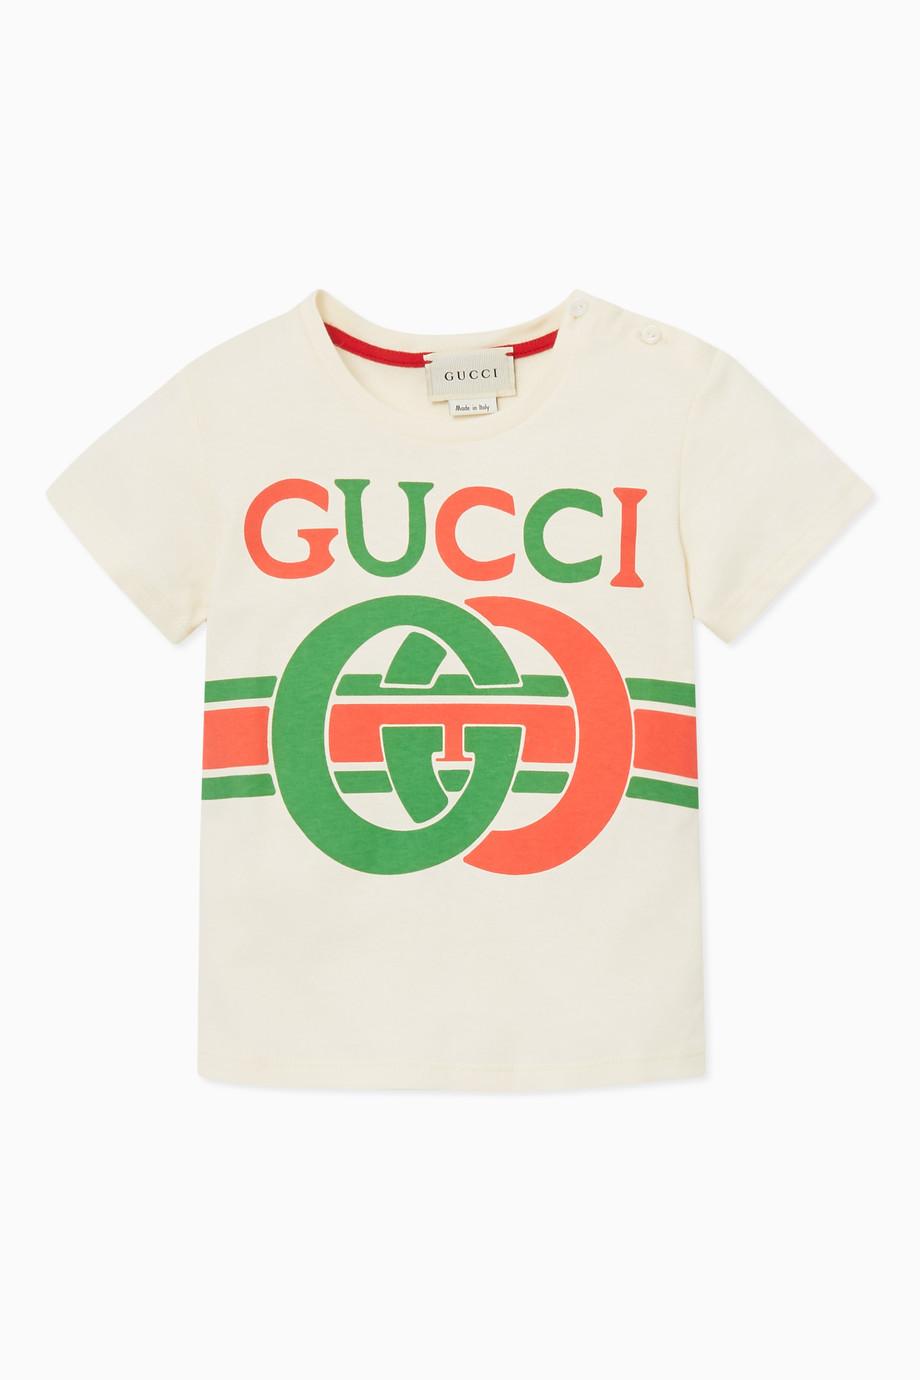 0bf5d7e0 Shop Gucci White GG Logo Print T-shirt for Kids | Ounass